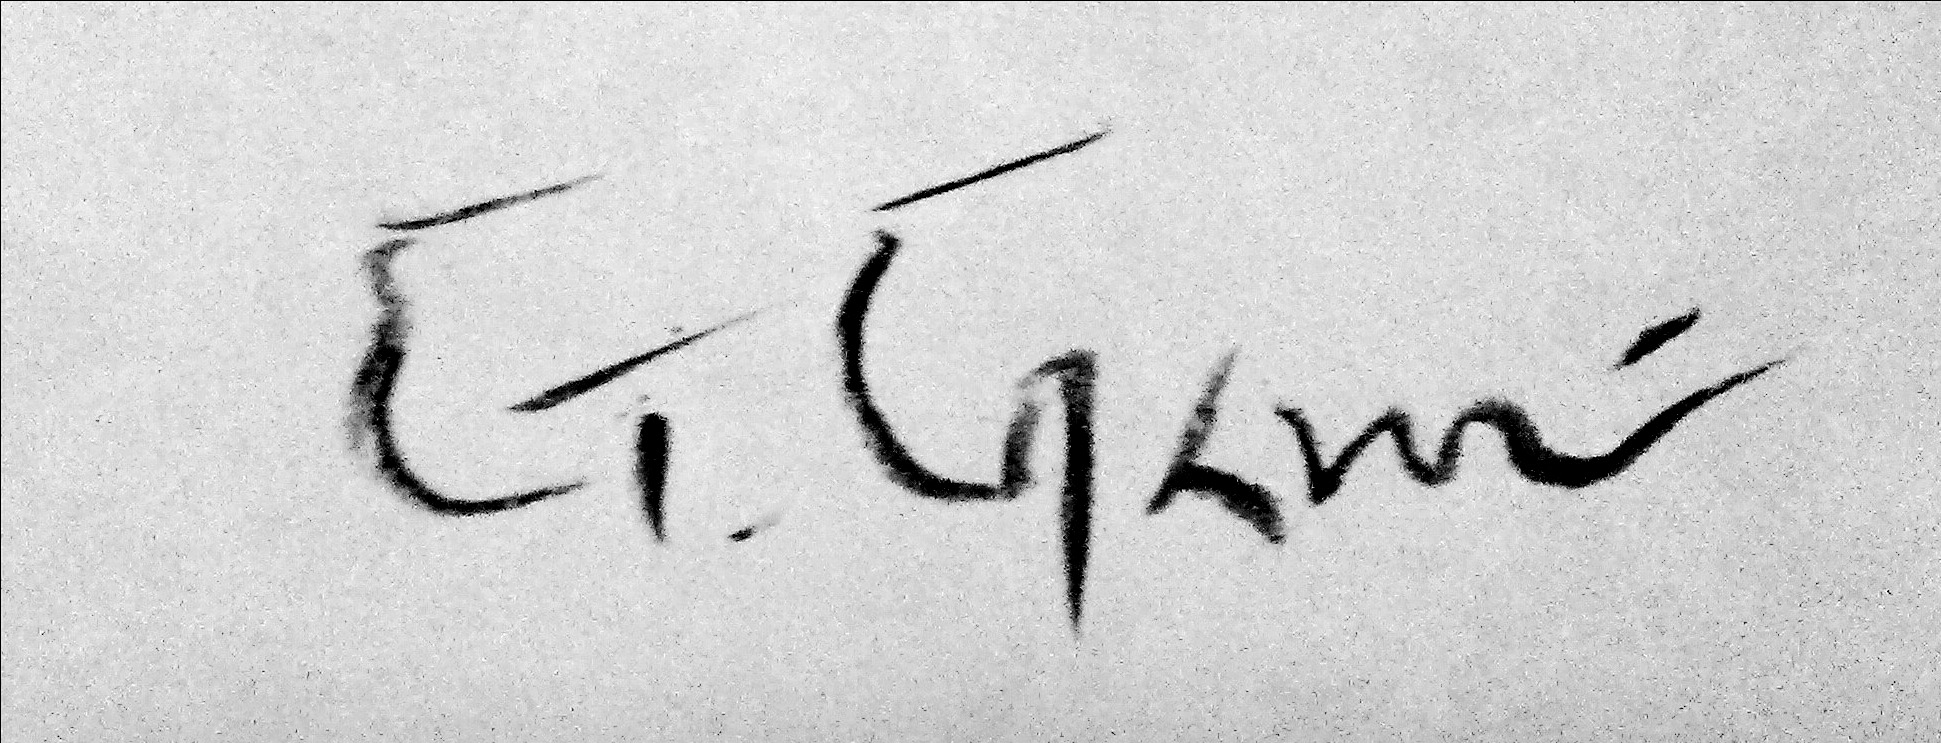 stella spanou's Signature